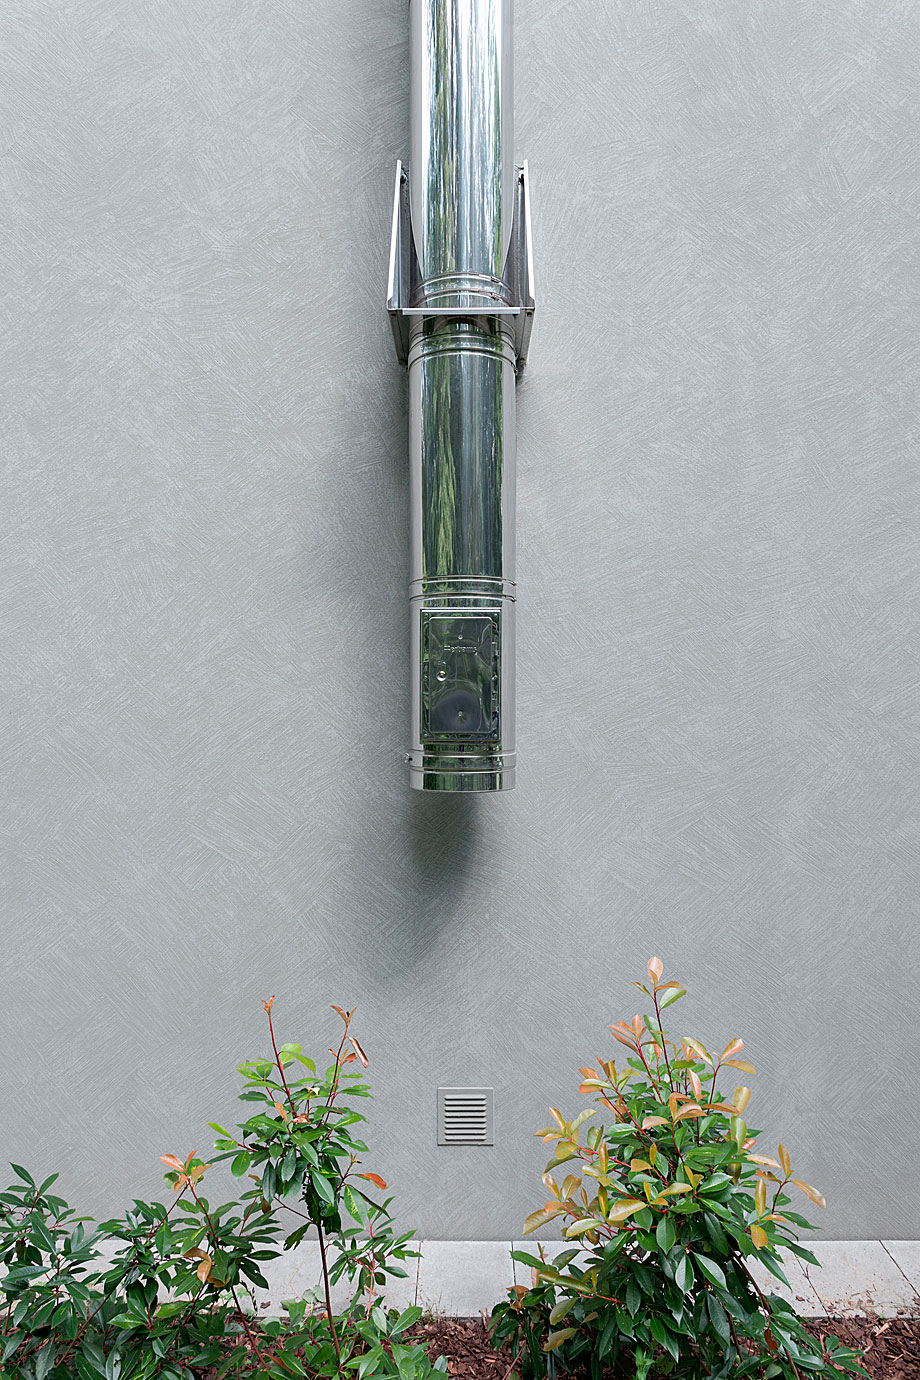 casa-unifamiliar-klanovice-adr-architects-21